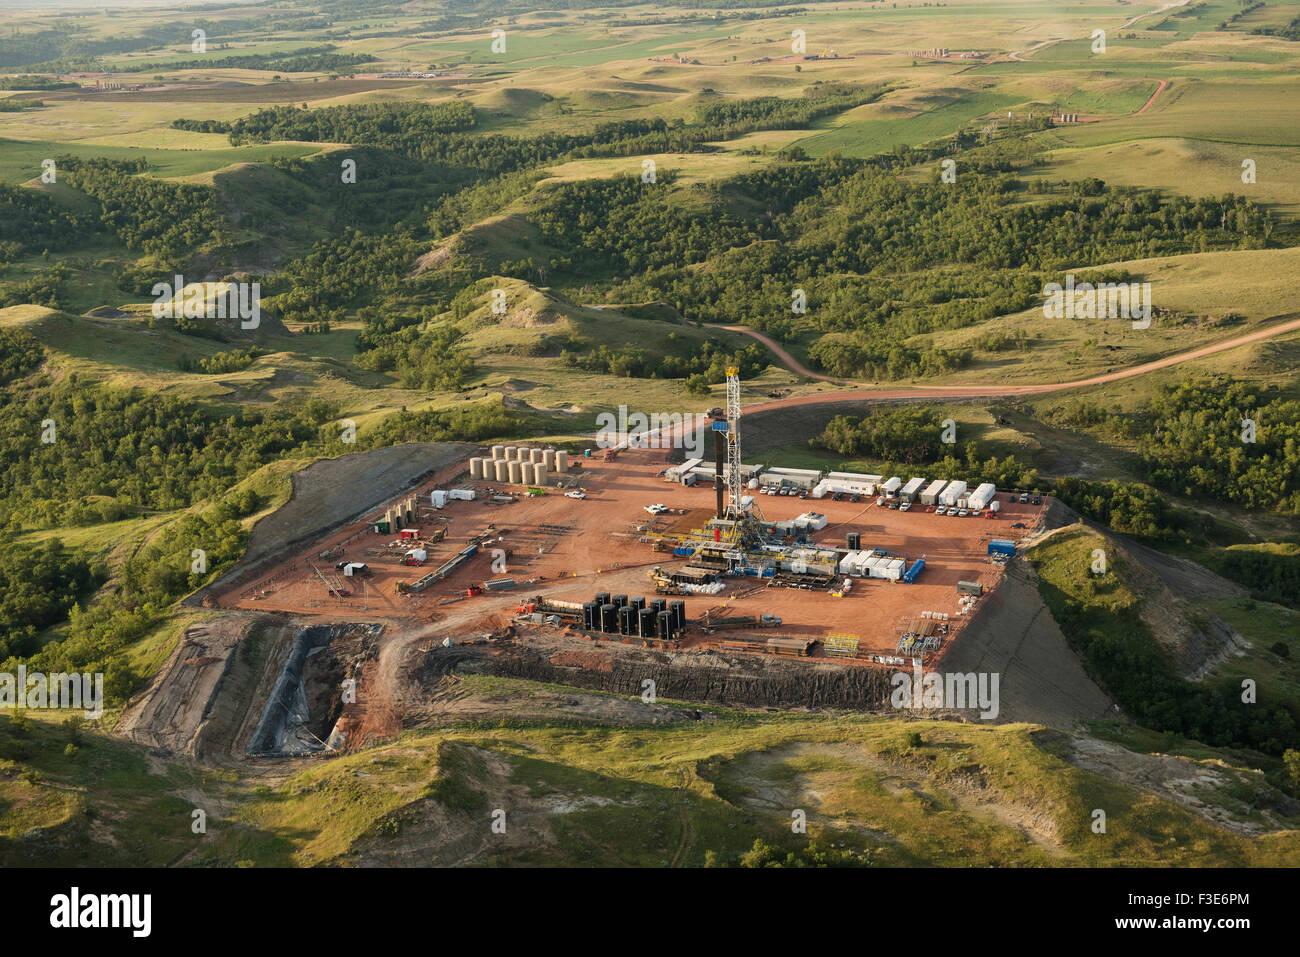 Oil development in the Bakken Formation among the bluffs of the Little Missouri River, North Dakota. - Stock Image